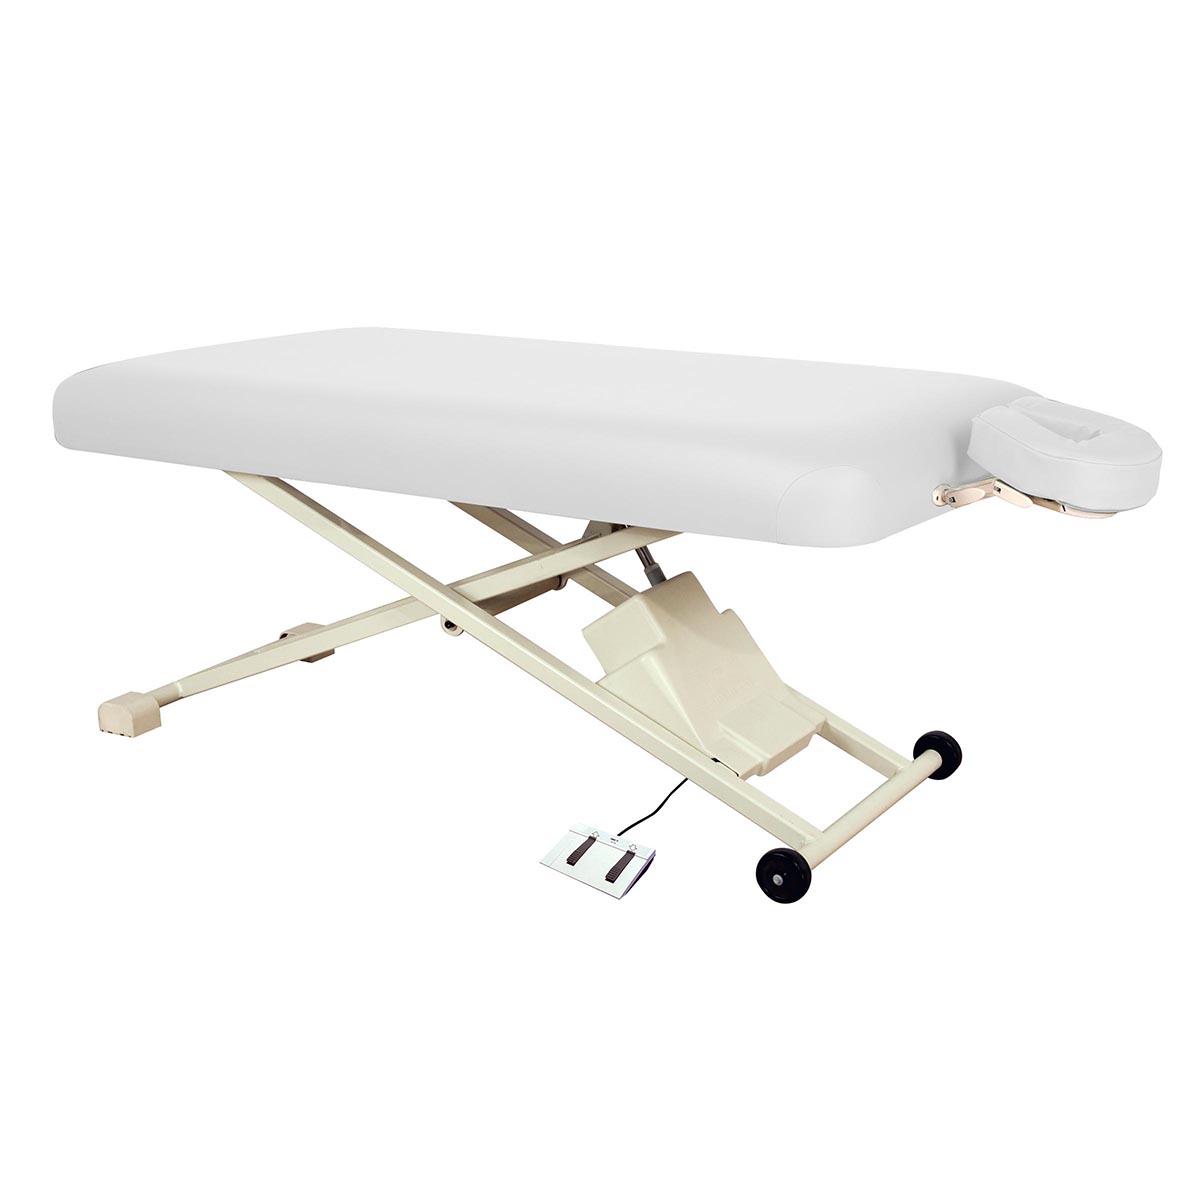 Proluxe Seville Lift Table Massage Tables